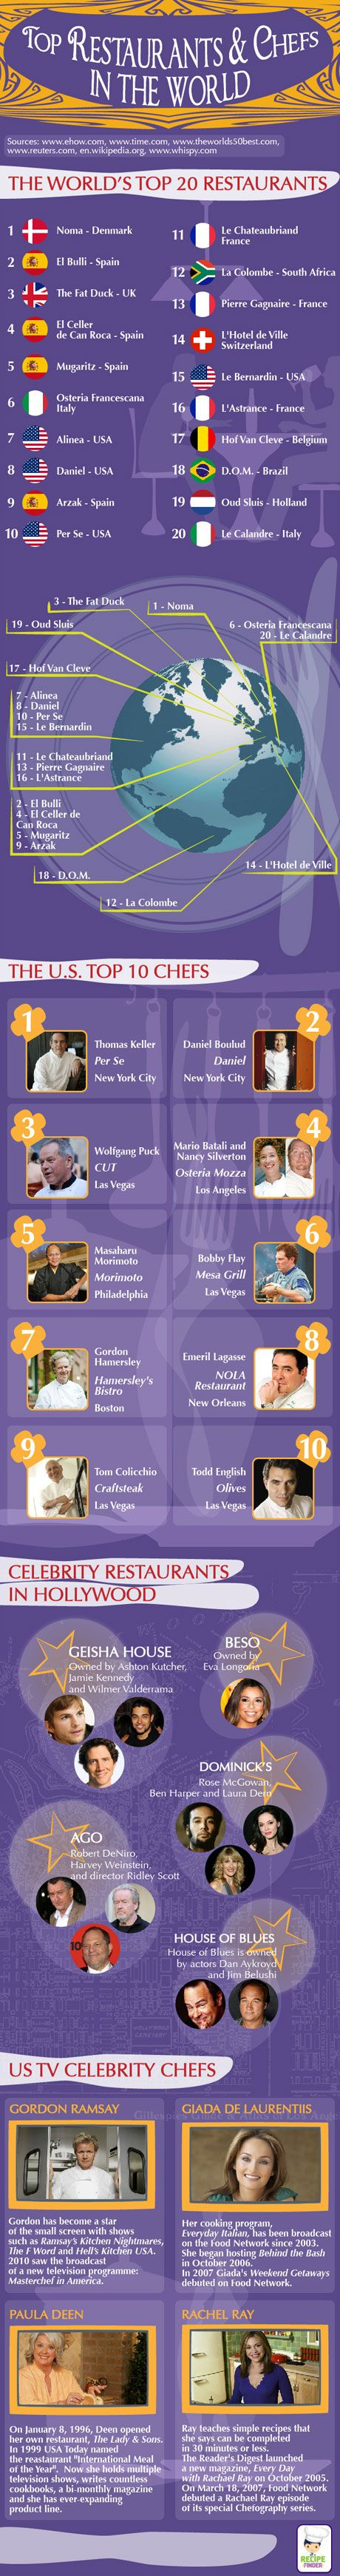 Infographic: Top Restaurants and Top Chefs Worldwide